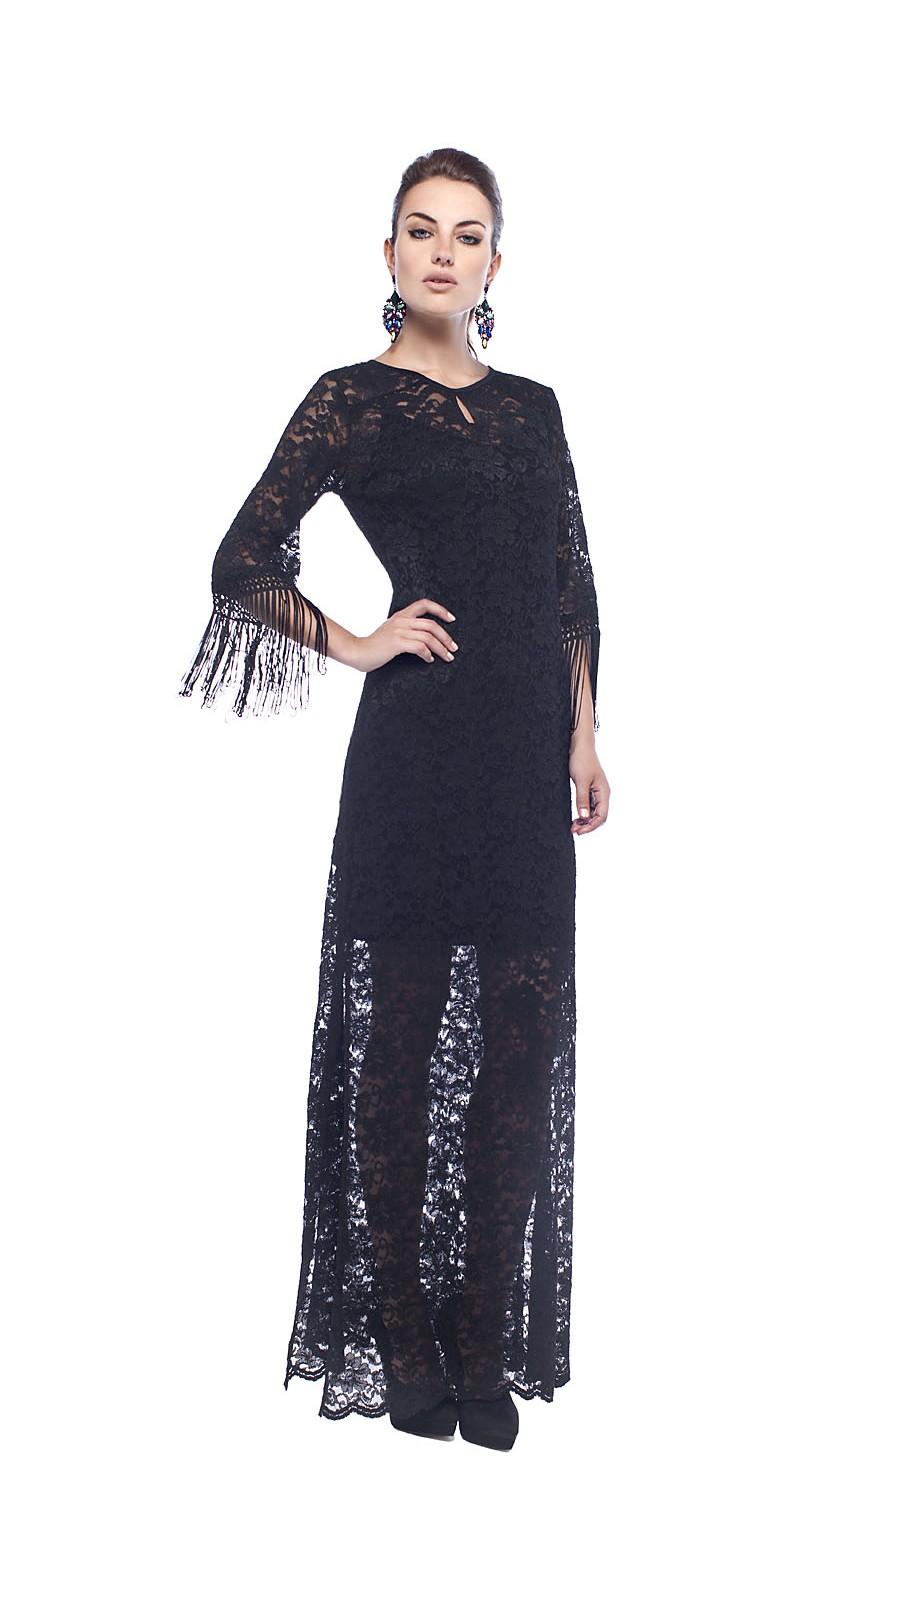 996d3de0bc6d Φόρεμα maxi δαντέλα με κρόσσια στα μανίκια - Open Fashion